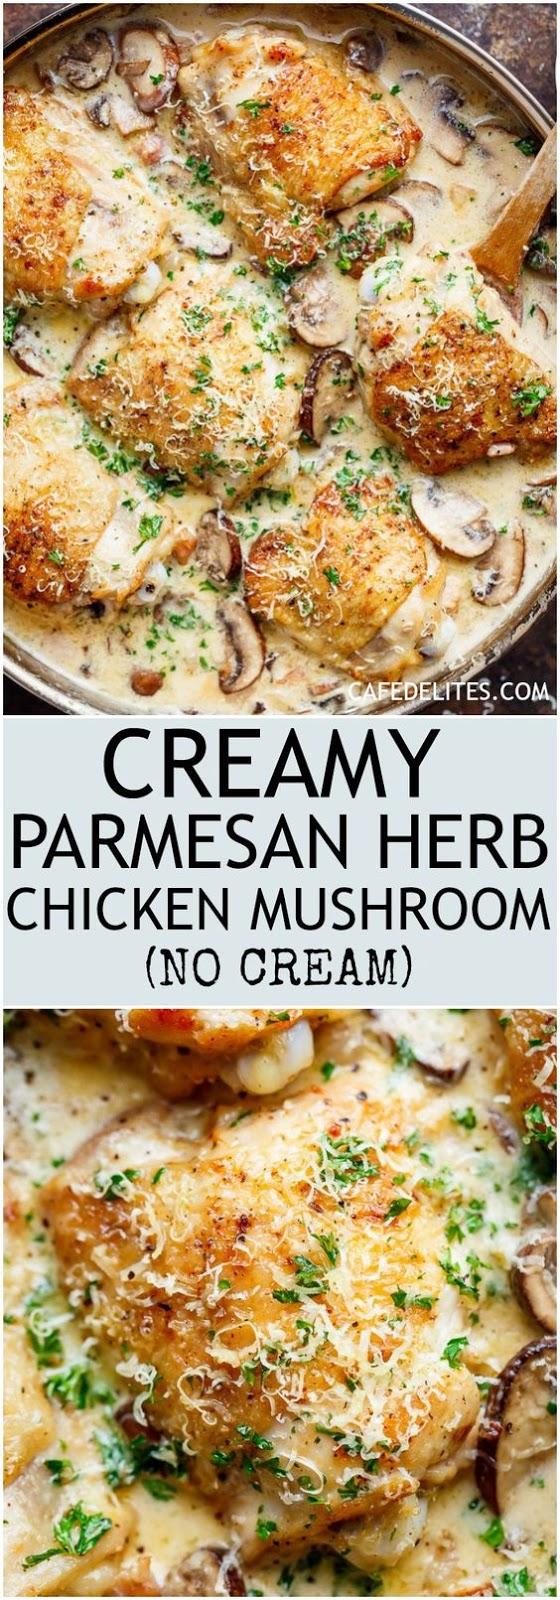 Creamy No Cream Parmesan Herb Chicken Mushroom